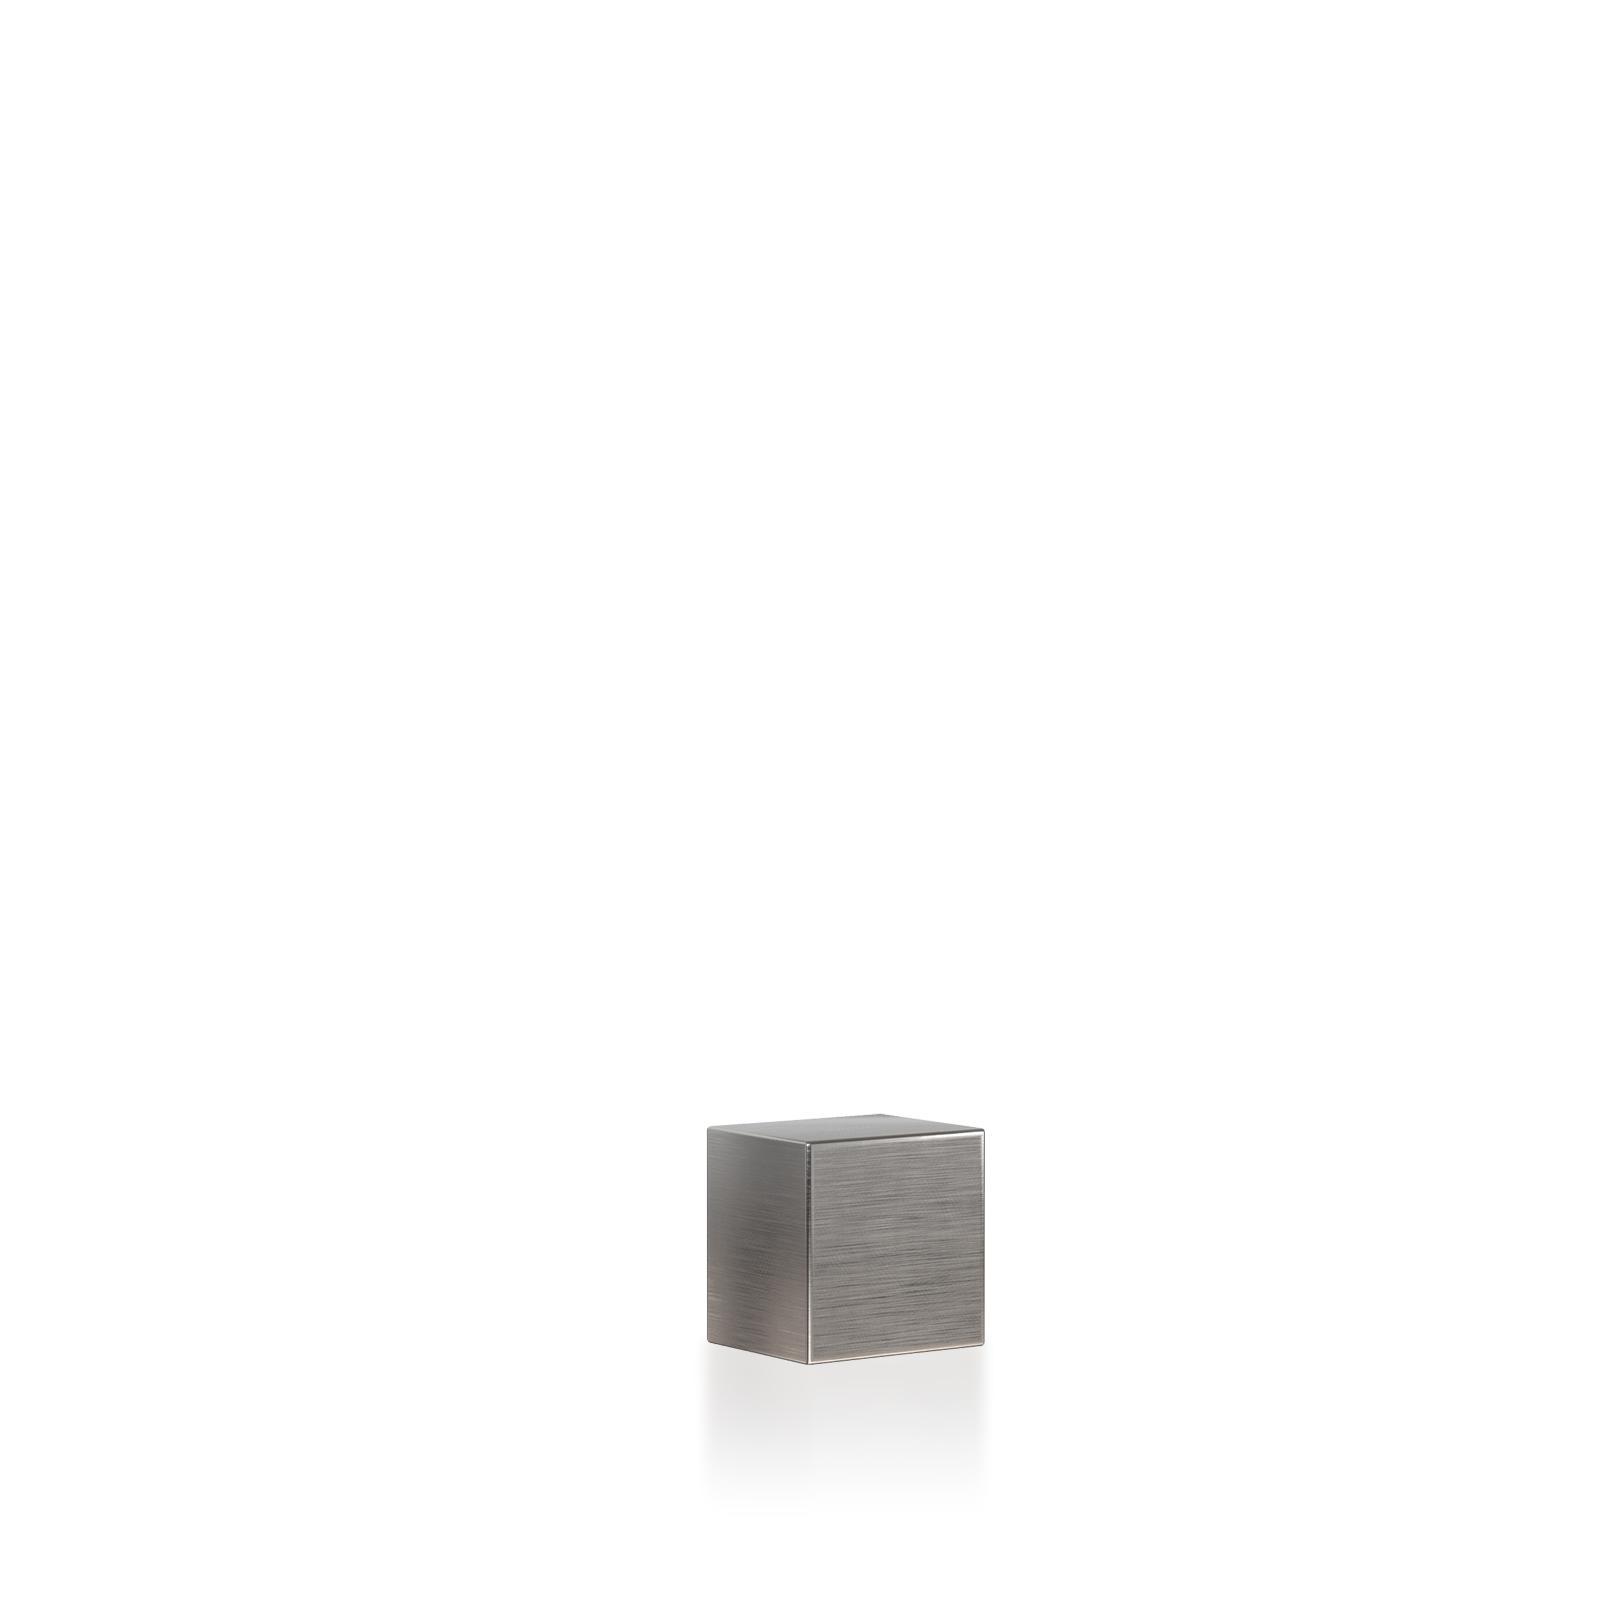 3D Hausnummer . Punkt Edelstahl in 3D Design Arial V2A